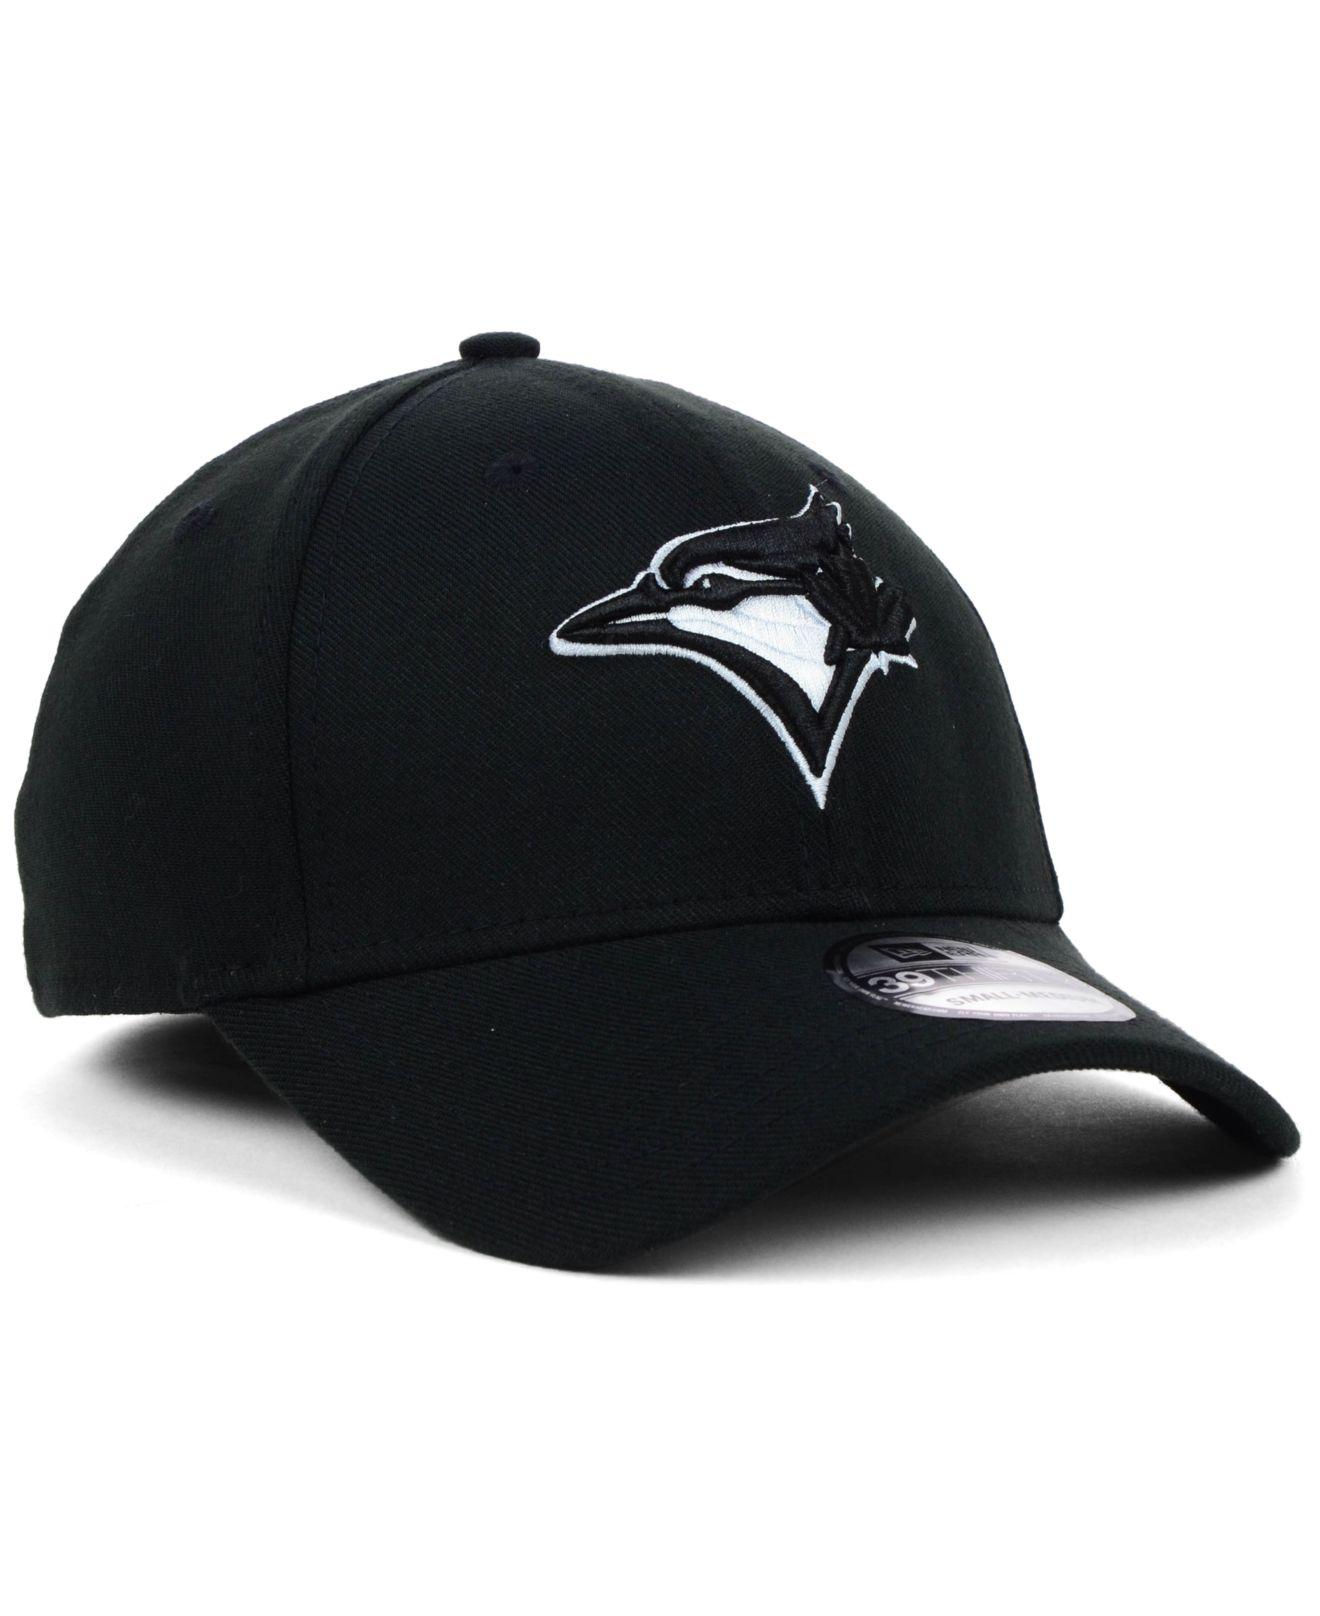 reputable site 038e9 a1b6e KTZ Toronto Blue Jays Black and White Classic 39thirty Cap in Black ...